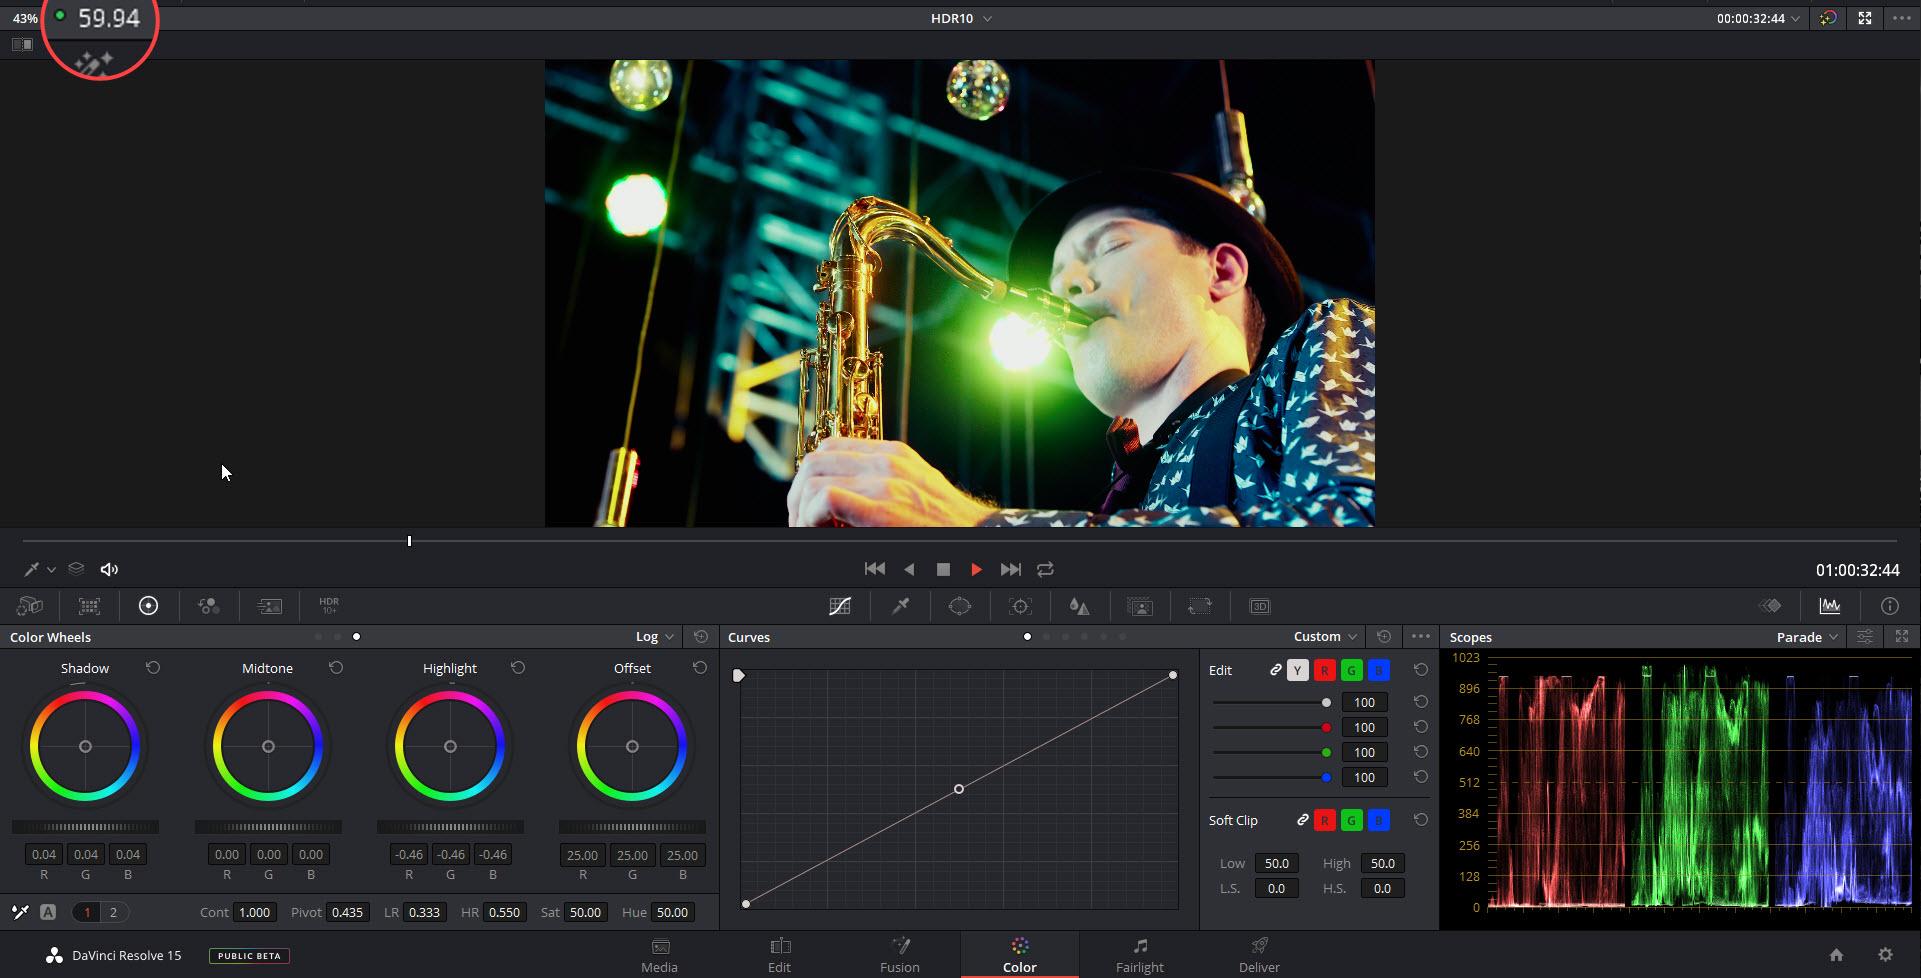 LG_HDR10_UHD_Enhanced Viewer.jpg